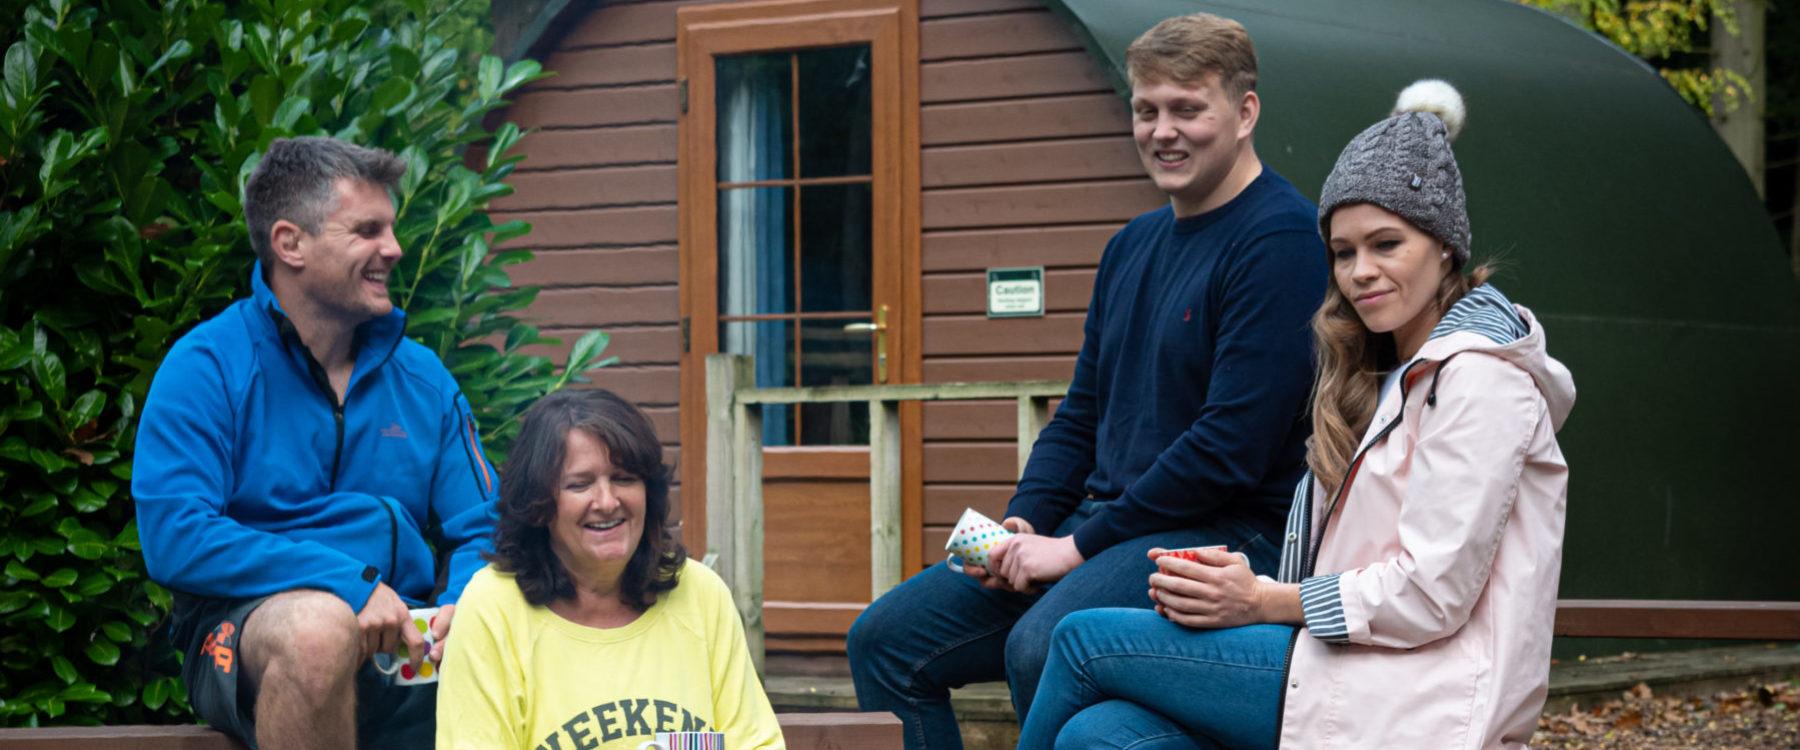 Family Glamping at Oaker Wood